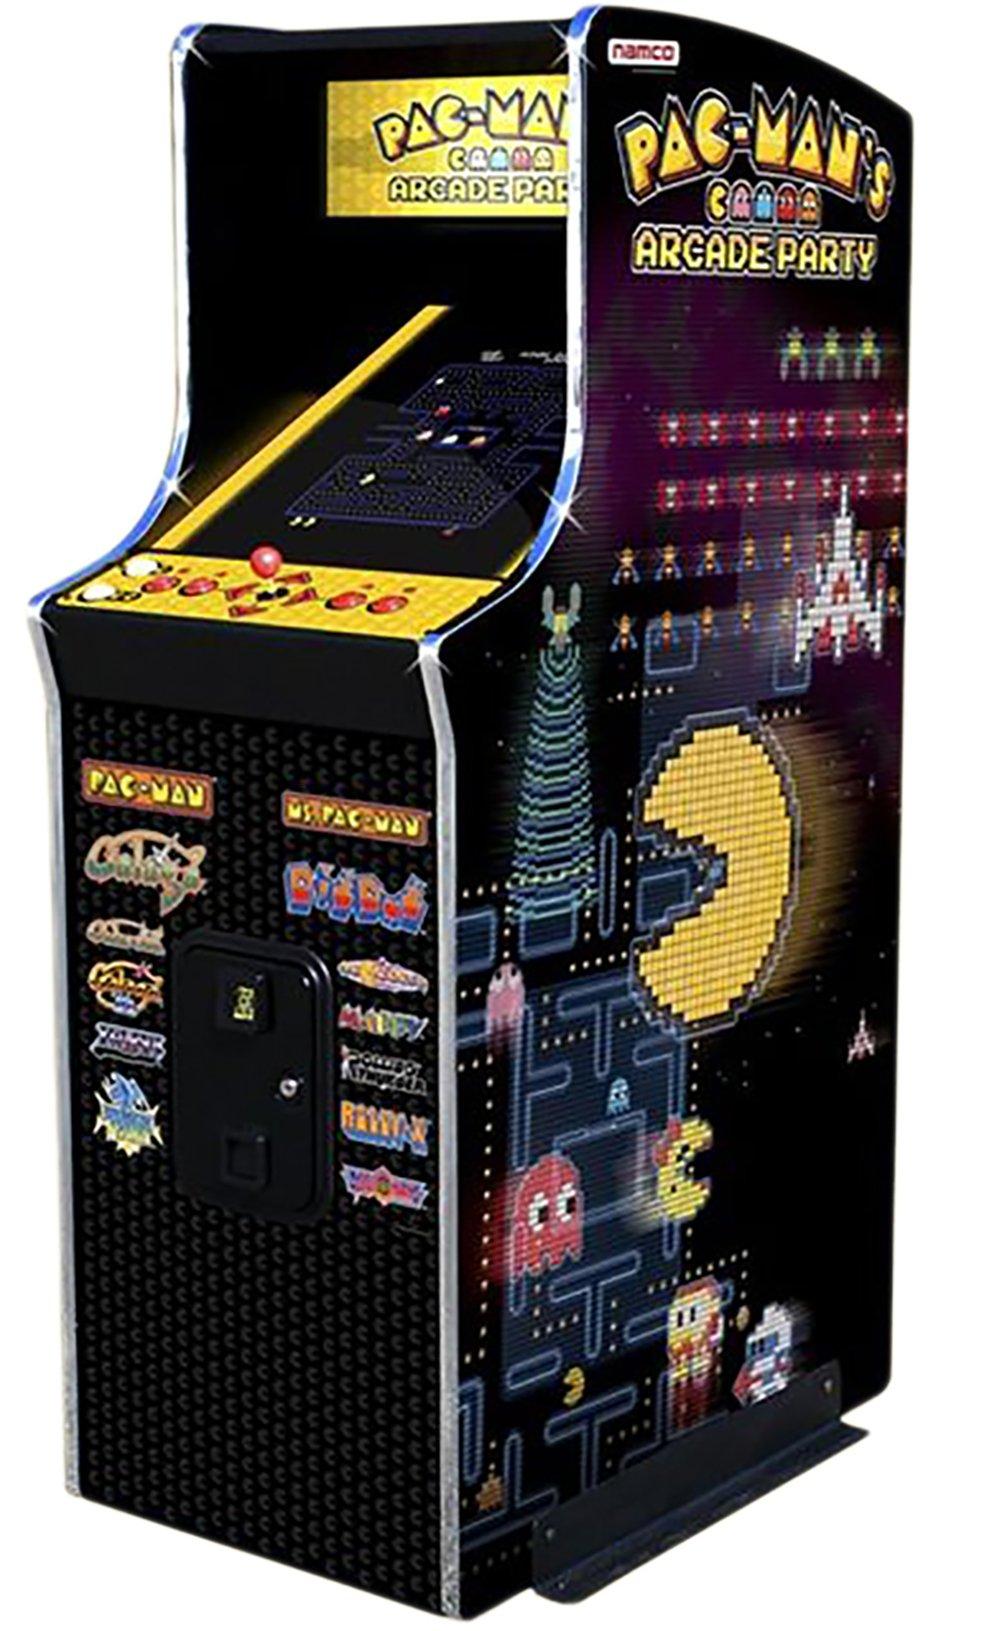 Namco Pacman Arcade Party Cabaret Arcade Game Machine by Namco